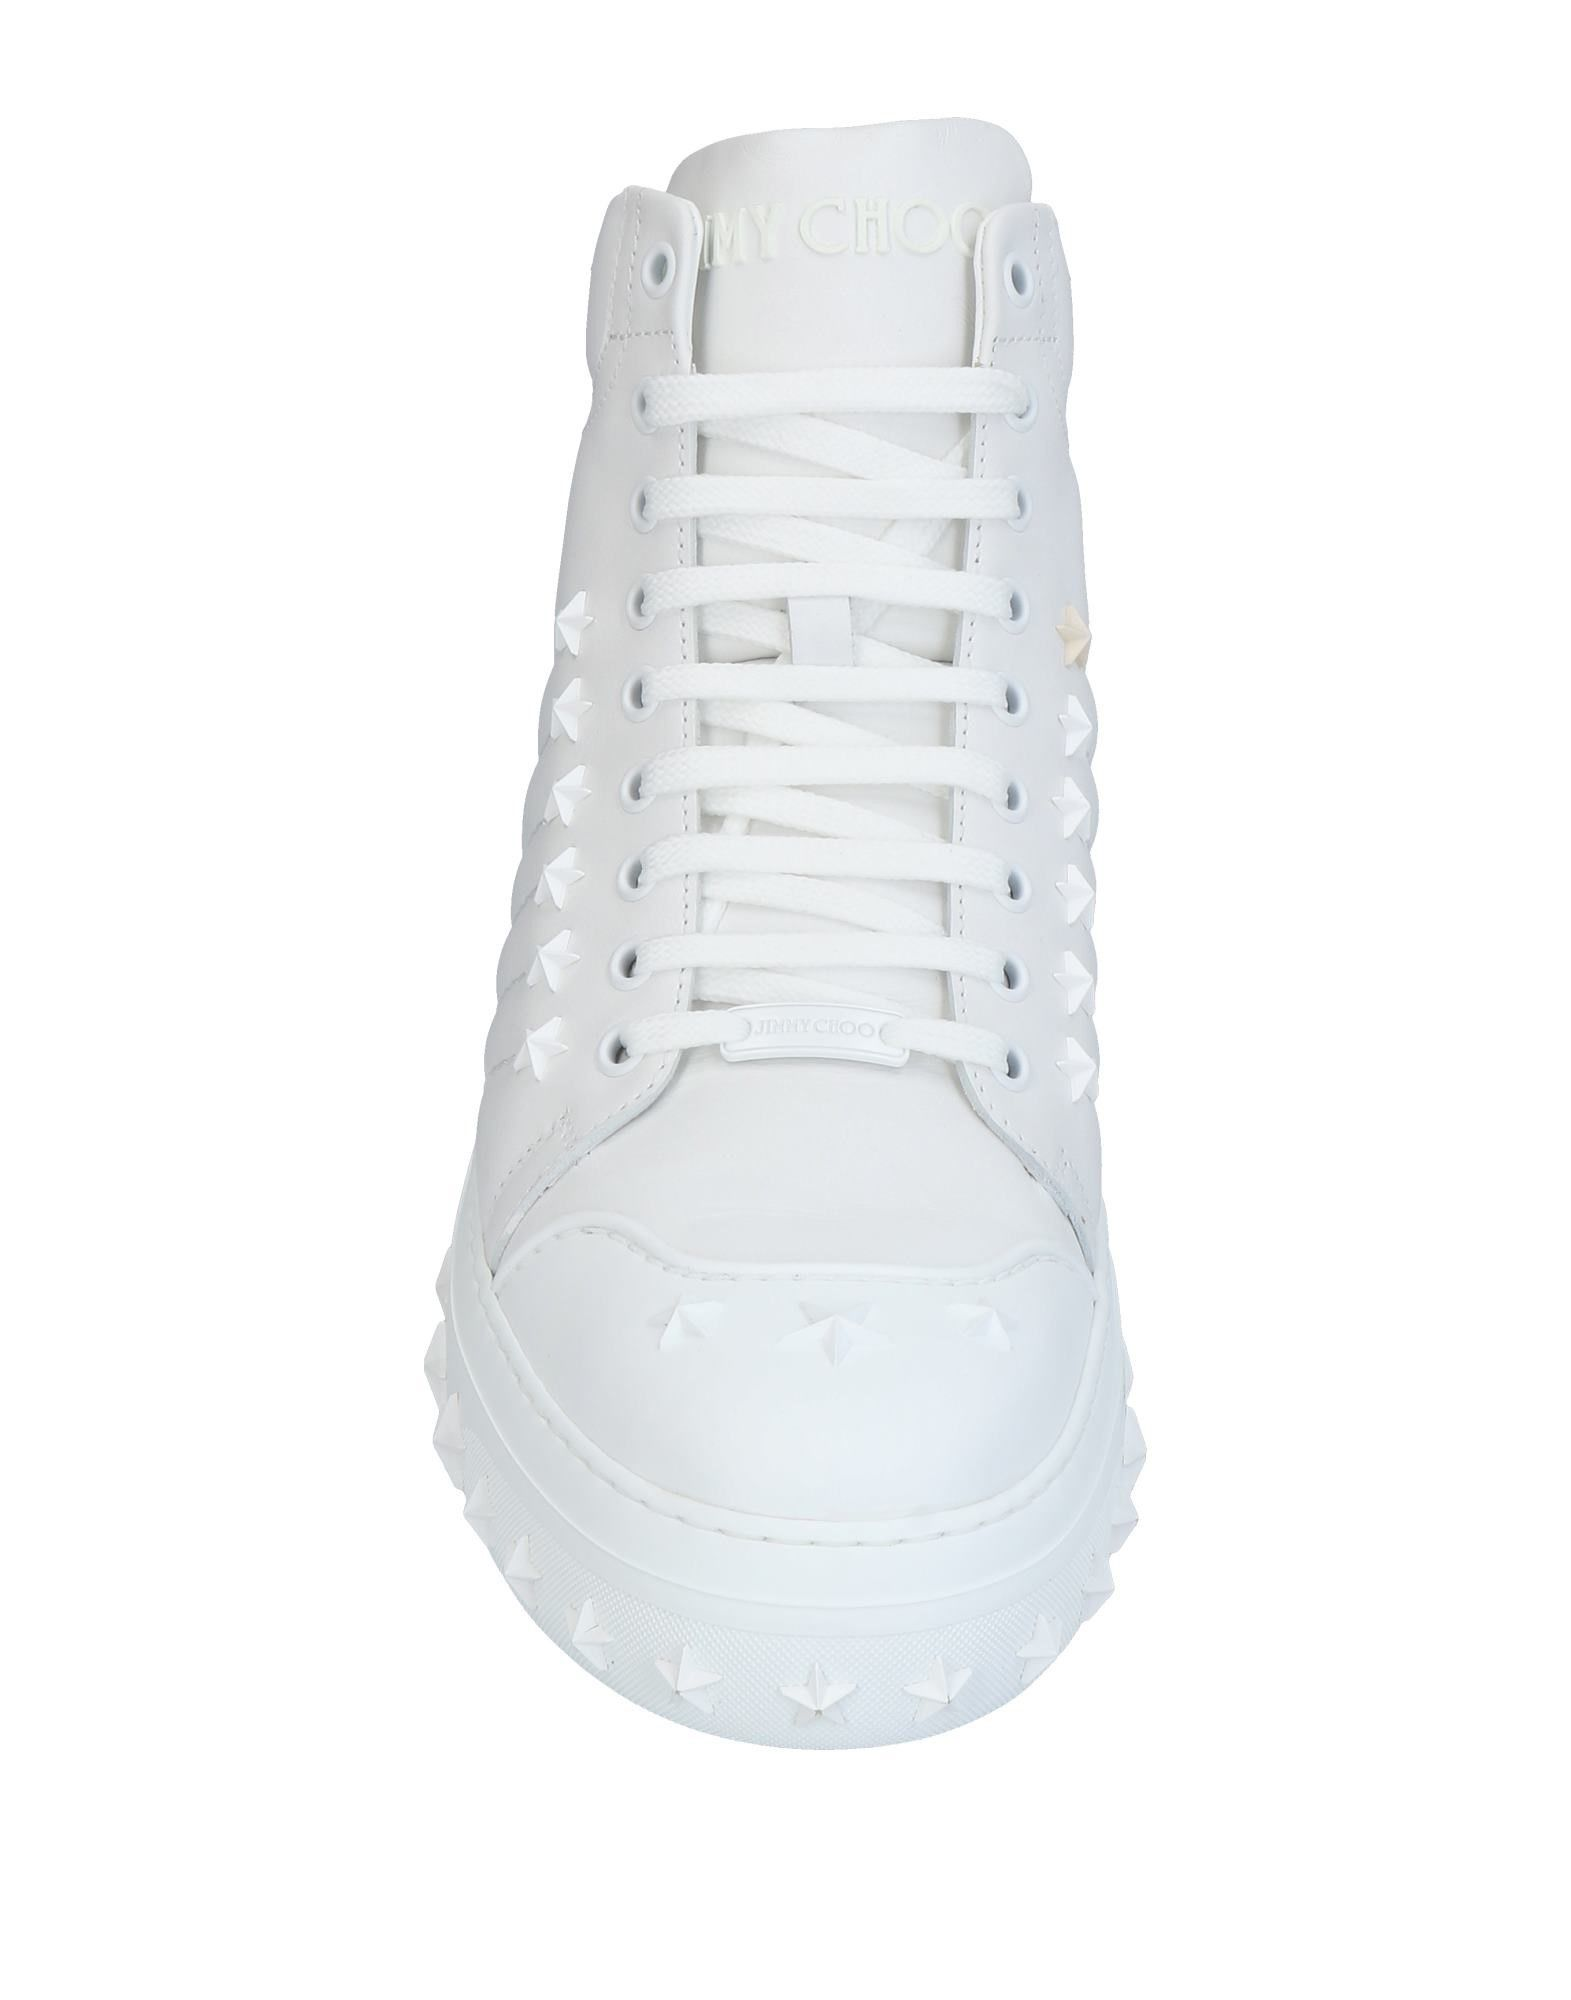 Jimmy 11460521XS Choo Sneakers Herren  11460521XS Jimmy Gute Qualität beliebte Schuhe 0472c8